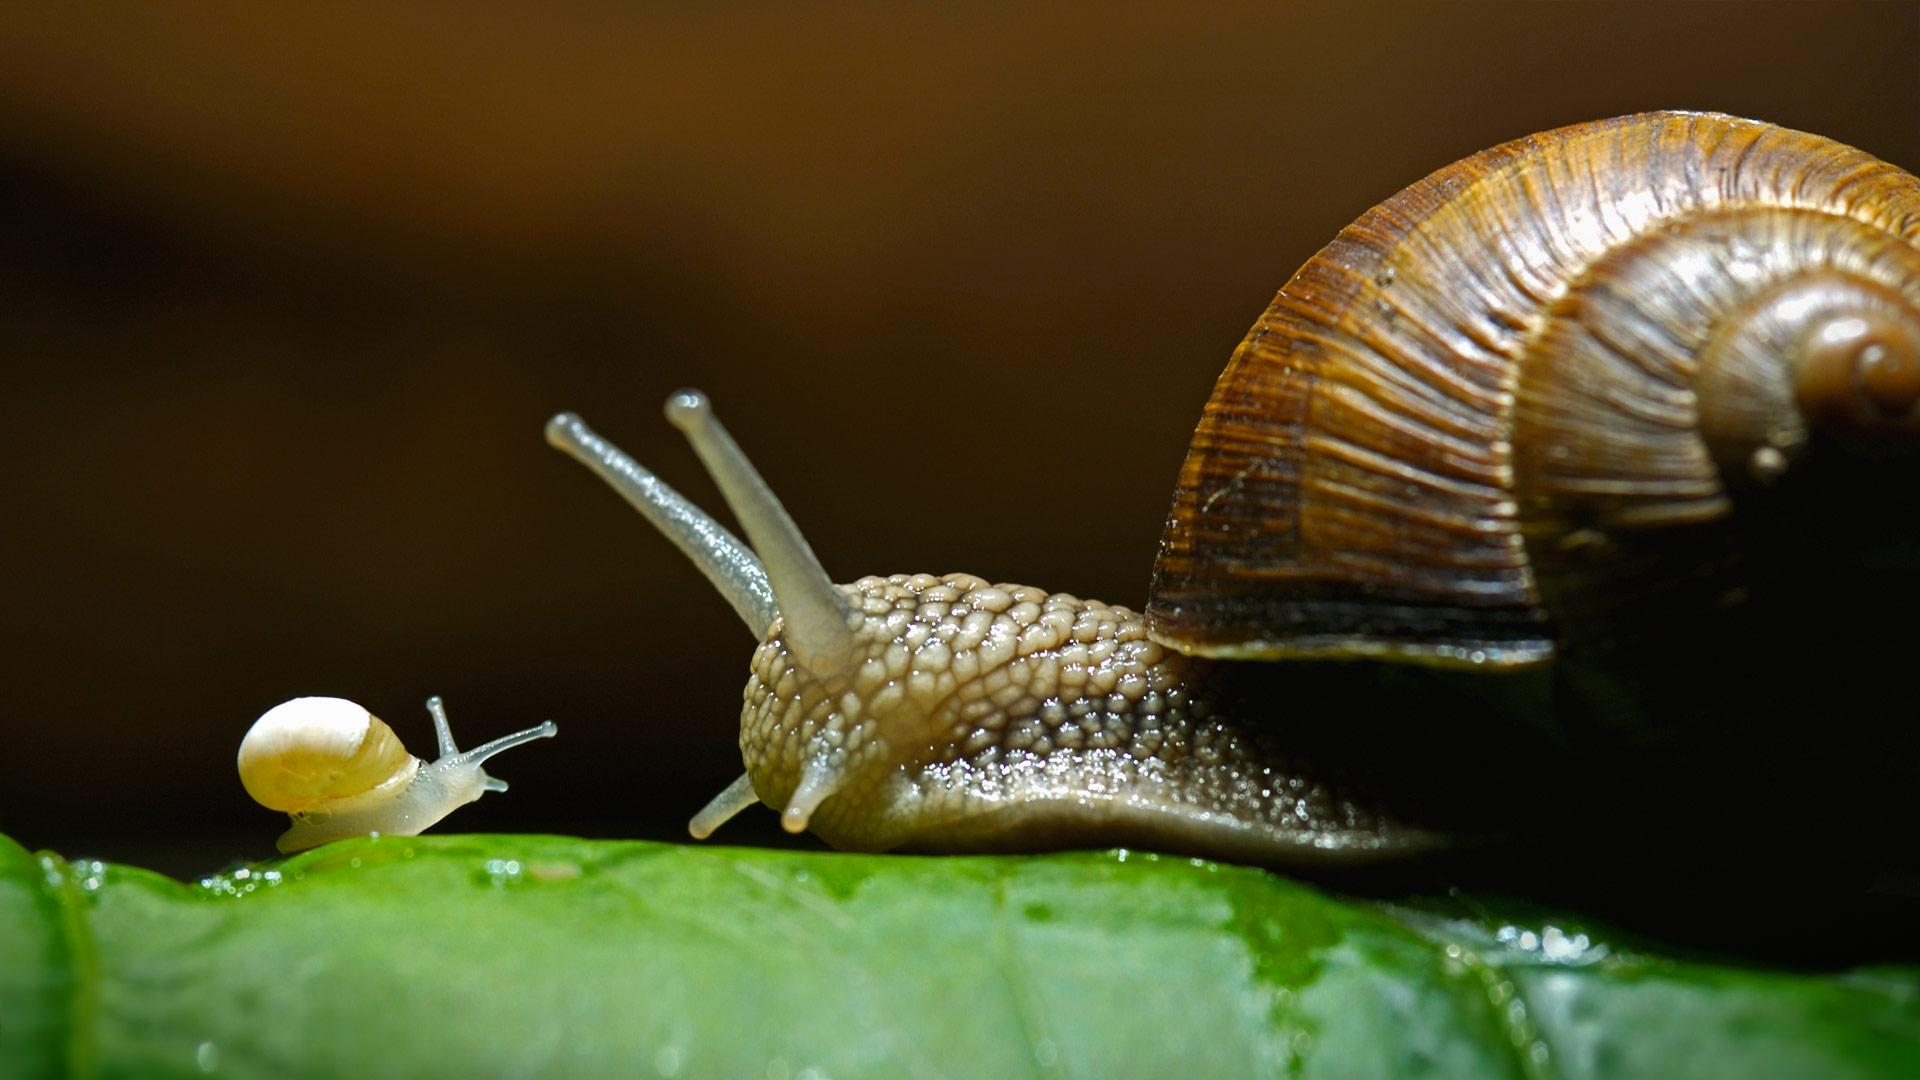 Burgundy snails, also called edible snails (© Heidi and Hans-Juergen Koch/Minden Pictures)(Bing United States)